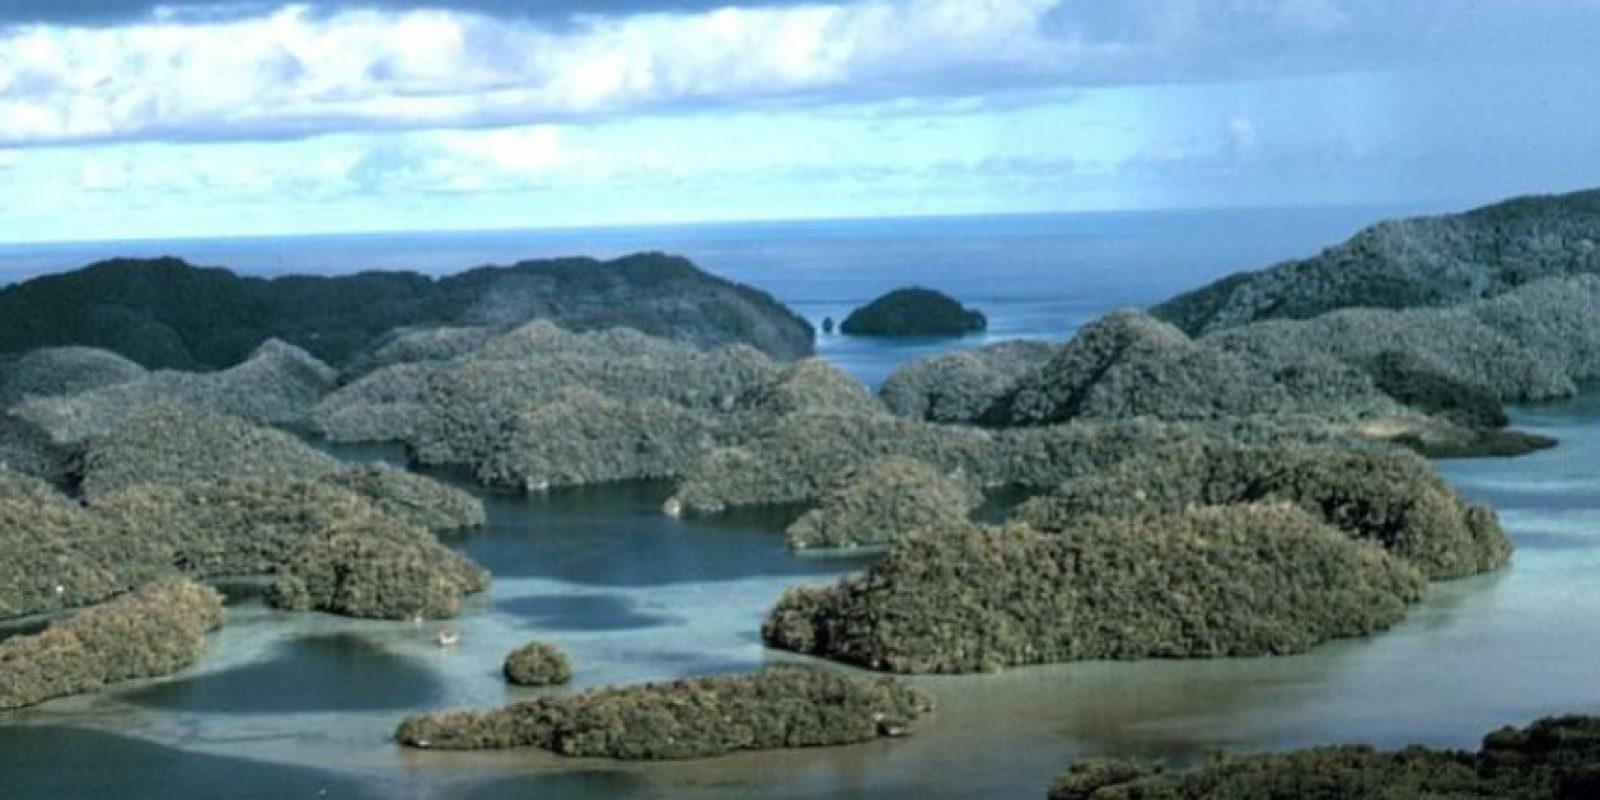 4. Palau Foto:Getty Images